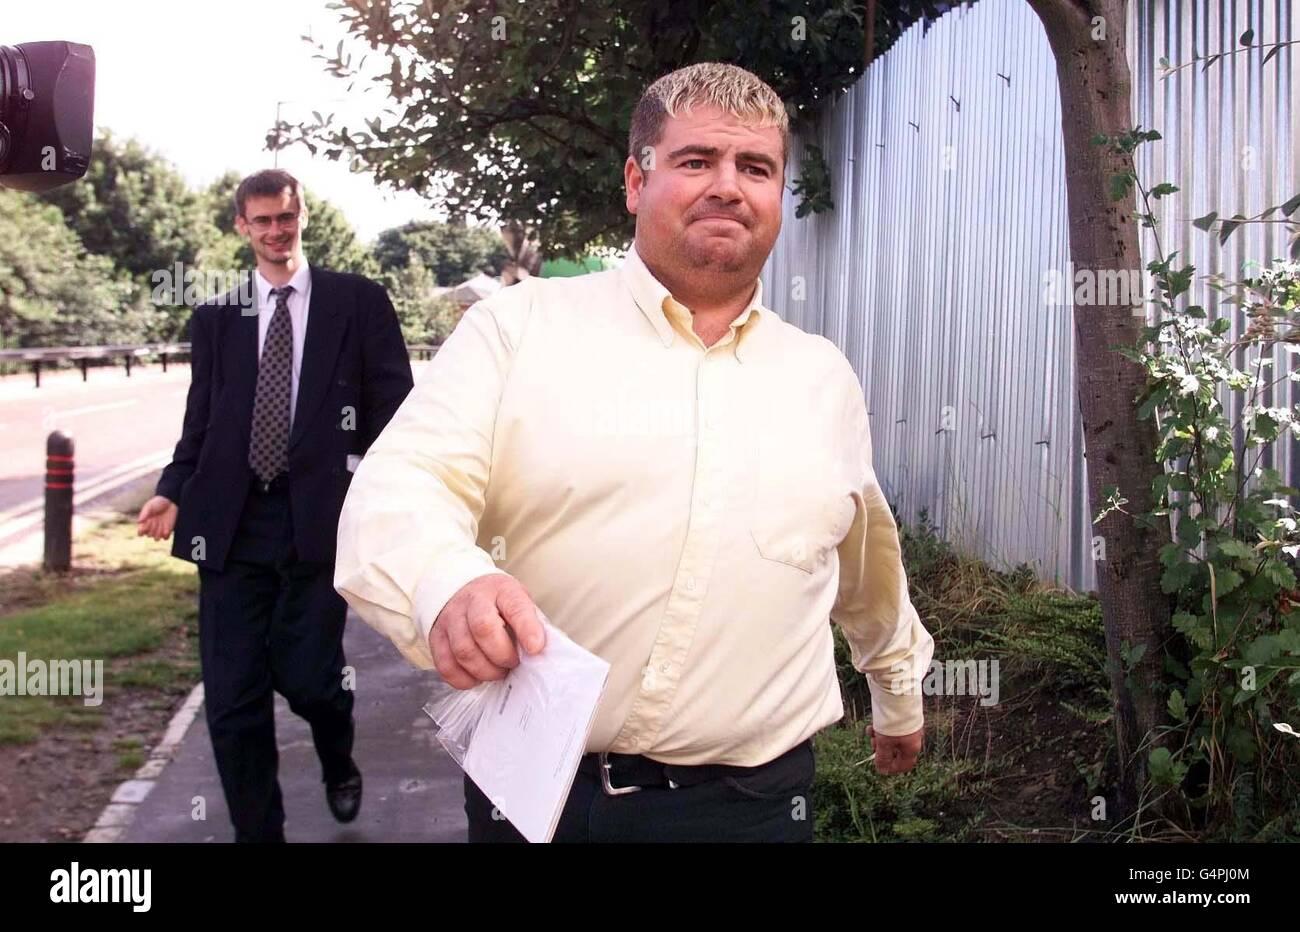 Jimmy Gardner leaves prison - Stock Image